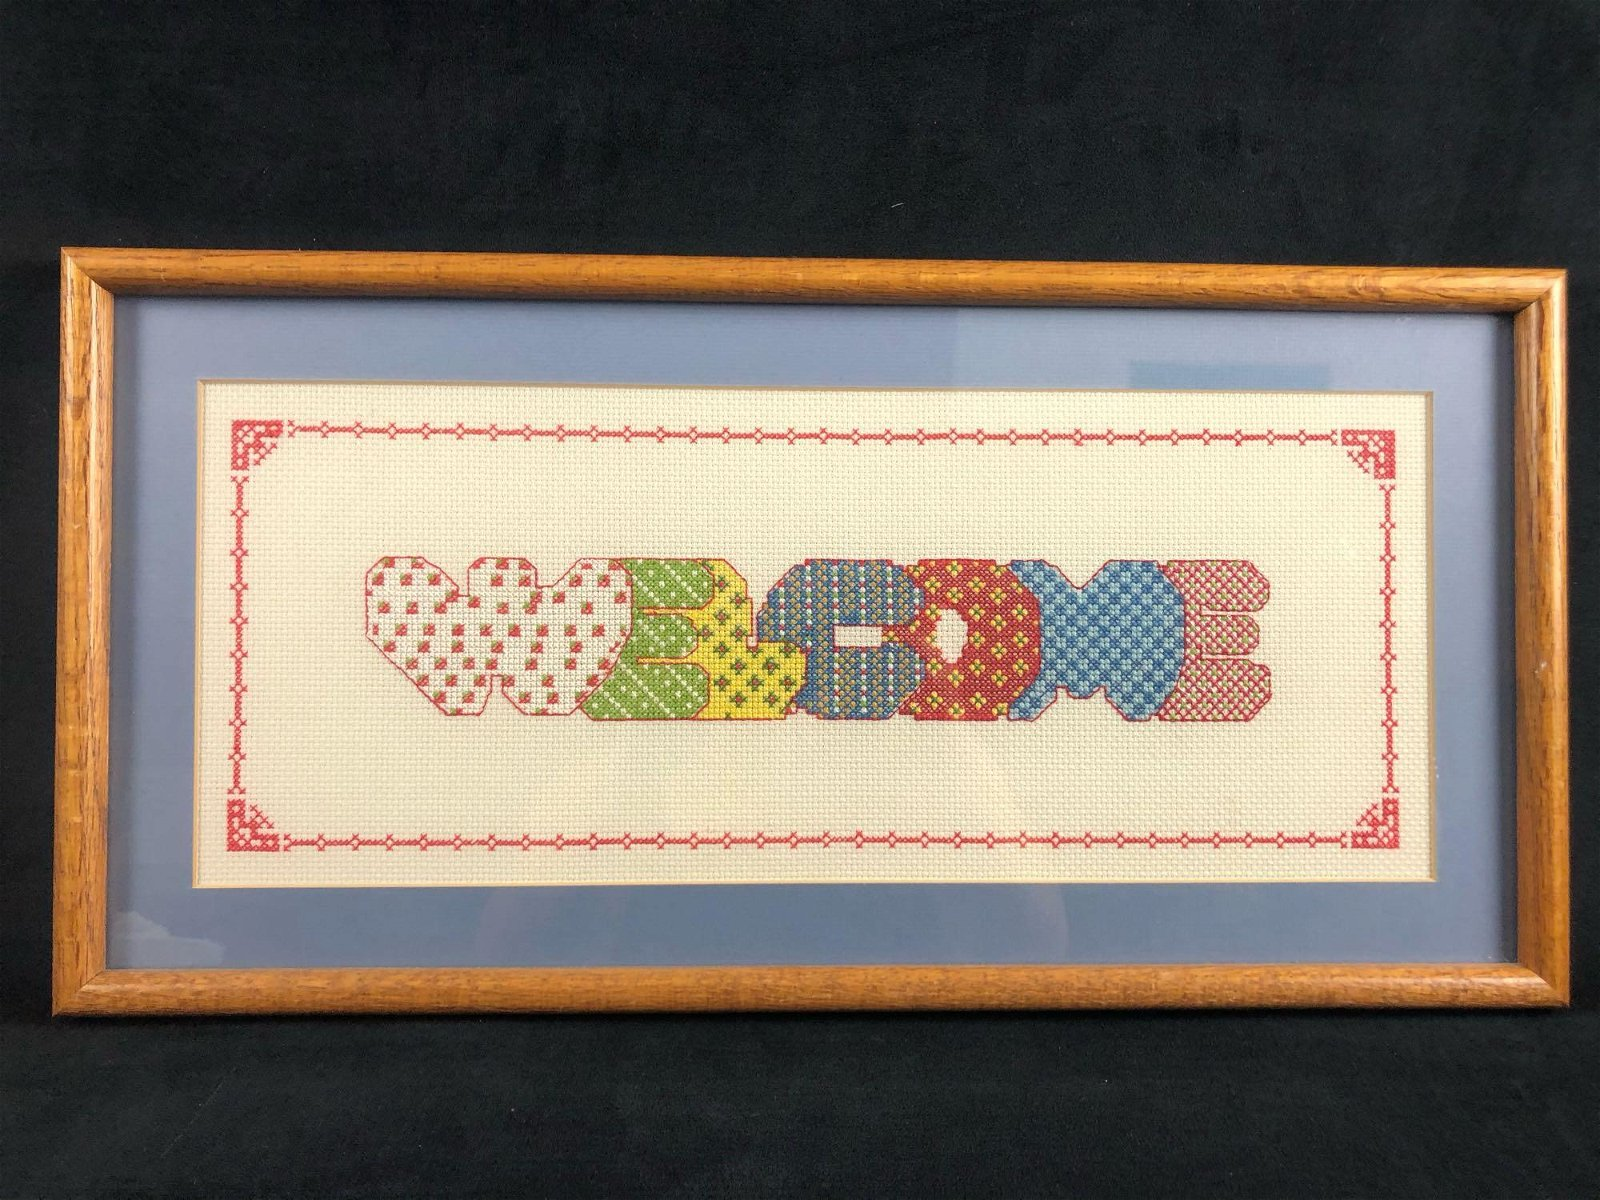 Vintage Wooden Framed Cross Stitch Welcome Sign Home